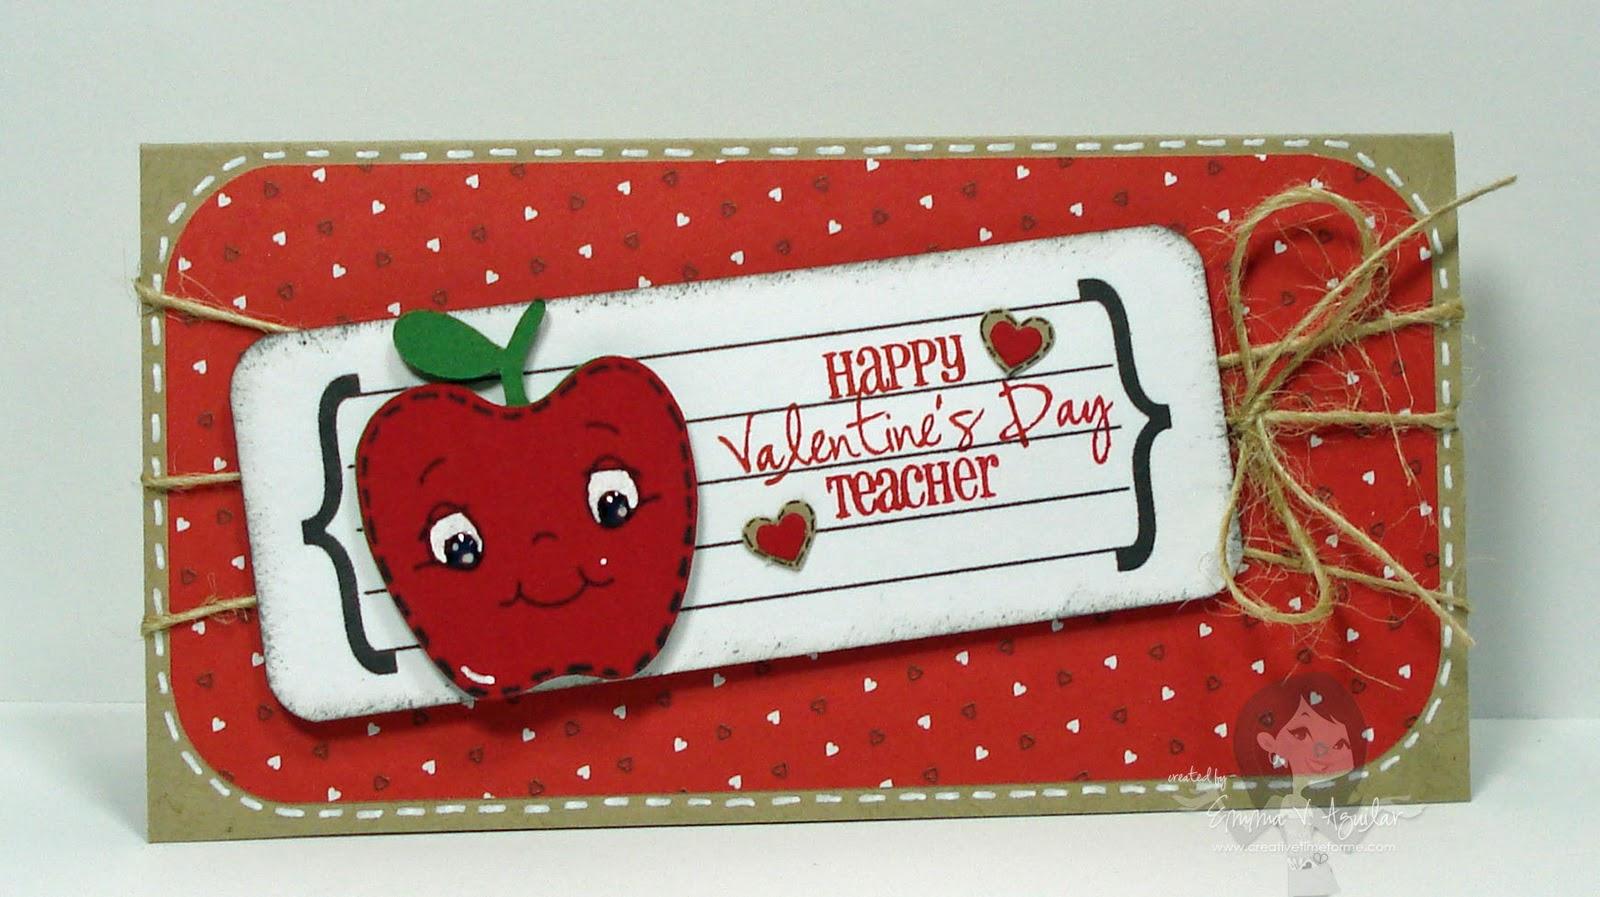 Happy Valentineu0027s Day Teacher!